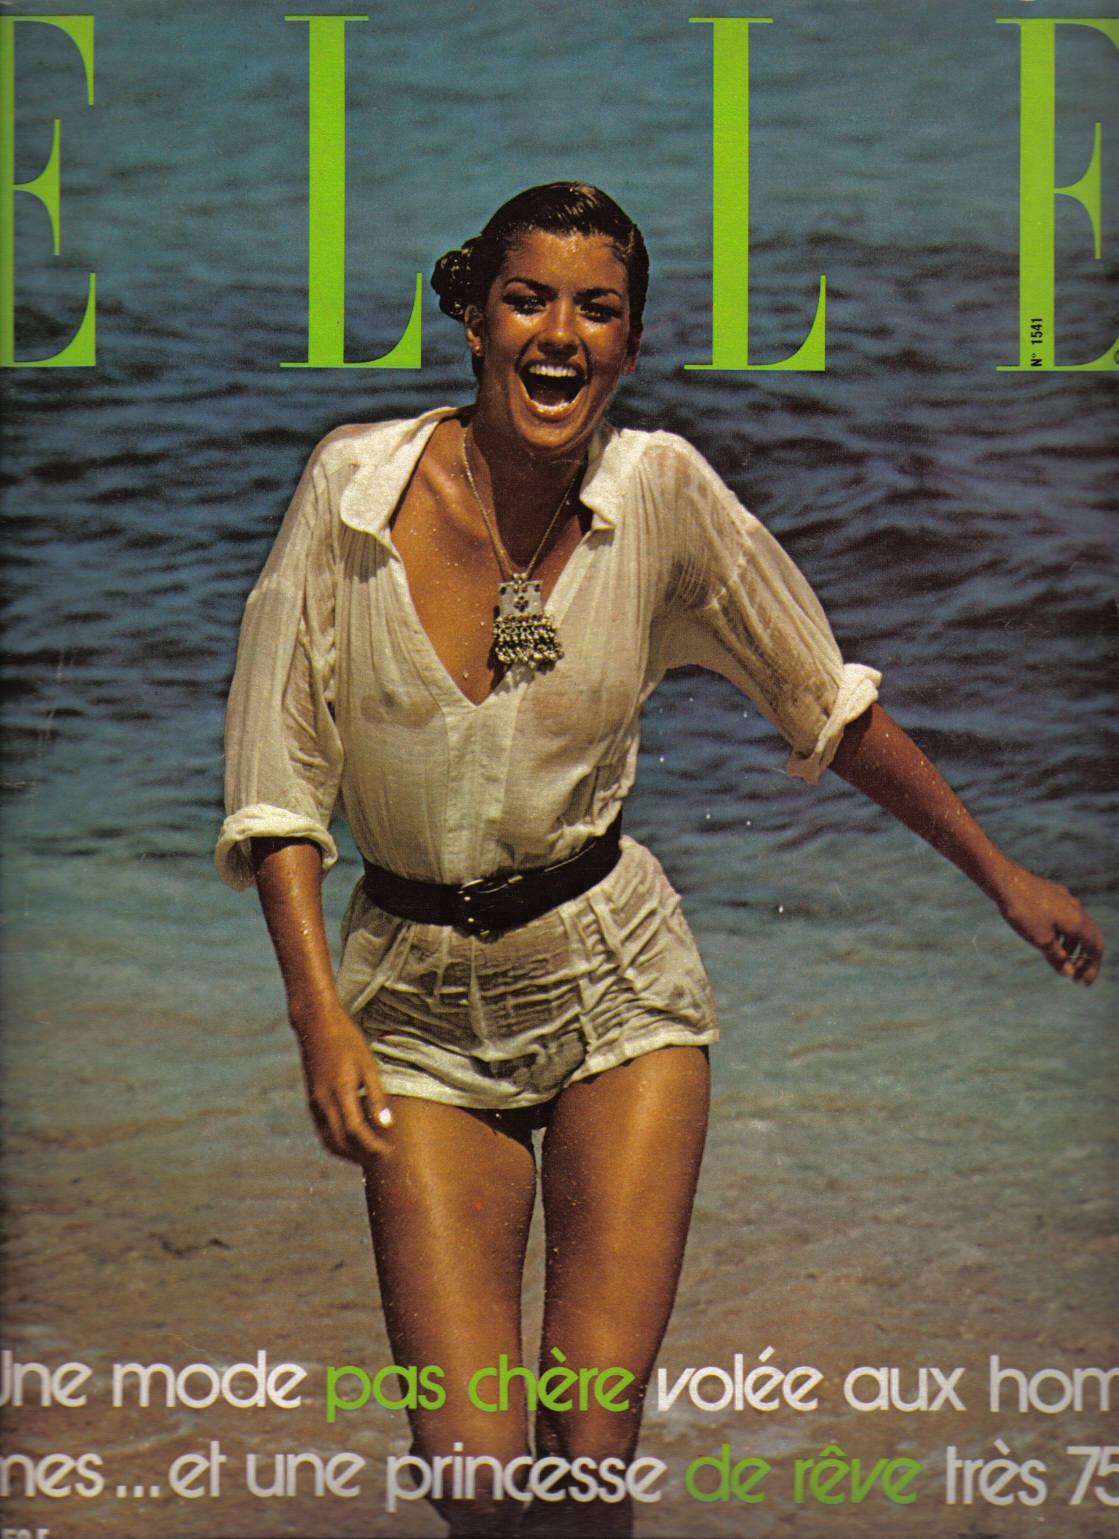 http://4.bp.blogspot.com/_n-gQAOkc7hQ/TD8B27BnbUI/AAAAAAAACXU/87qTkQcUvqw/s1600/9f5e1d1613b456e8_Elle_France_July21_1975_-_Janice_Dickinson.jpg